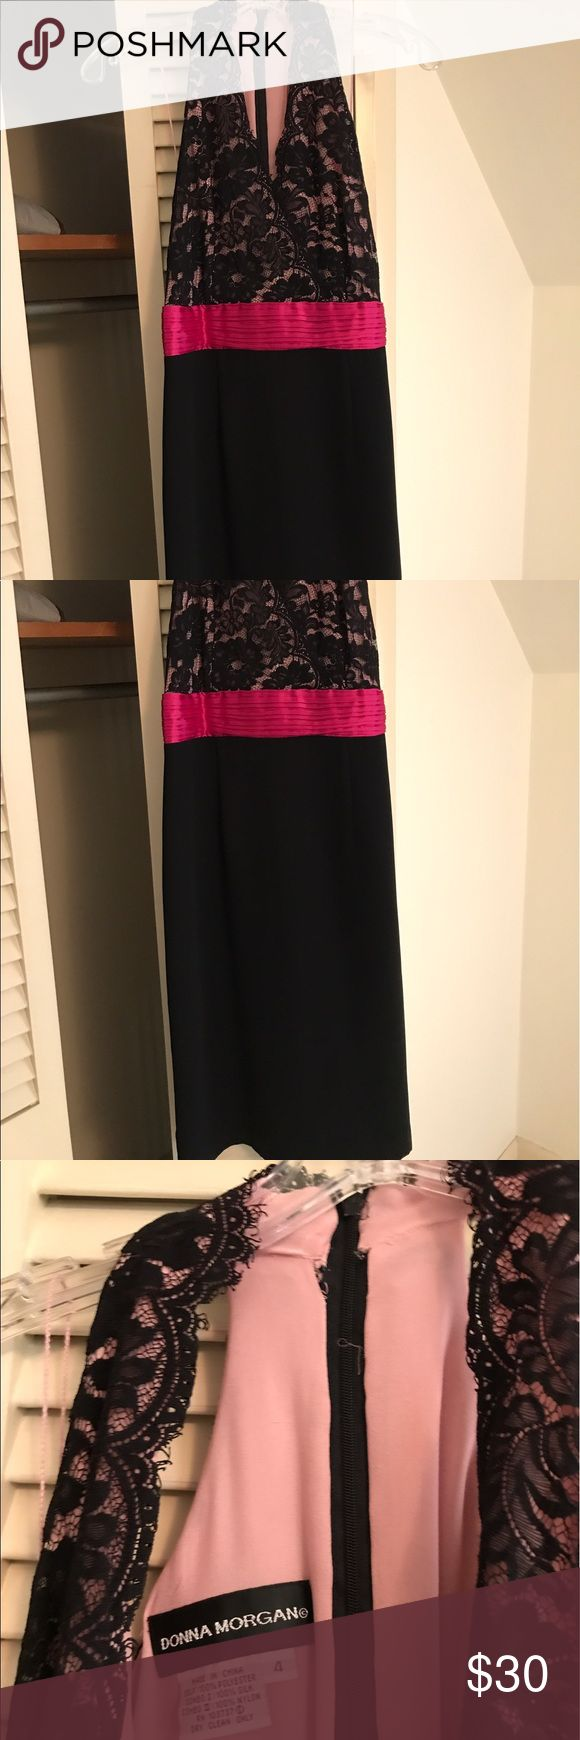 Donna Morgan dress Size 4- Donna Morgan dress- lace detail (slight damage on inside around zipper) Donna Morgan Dresses